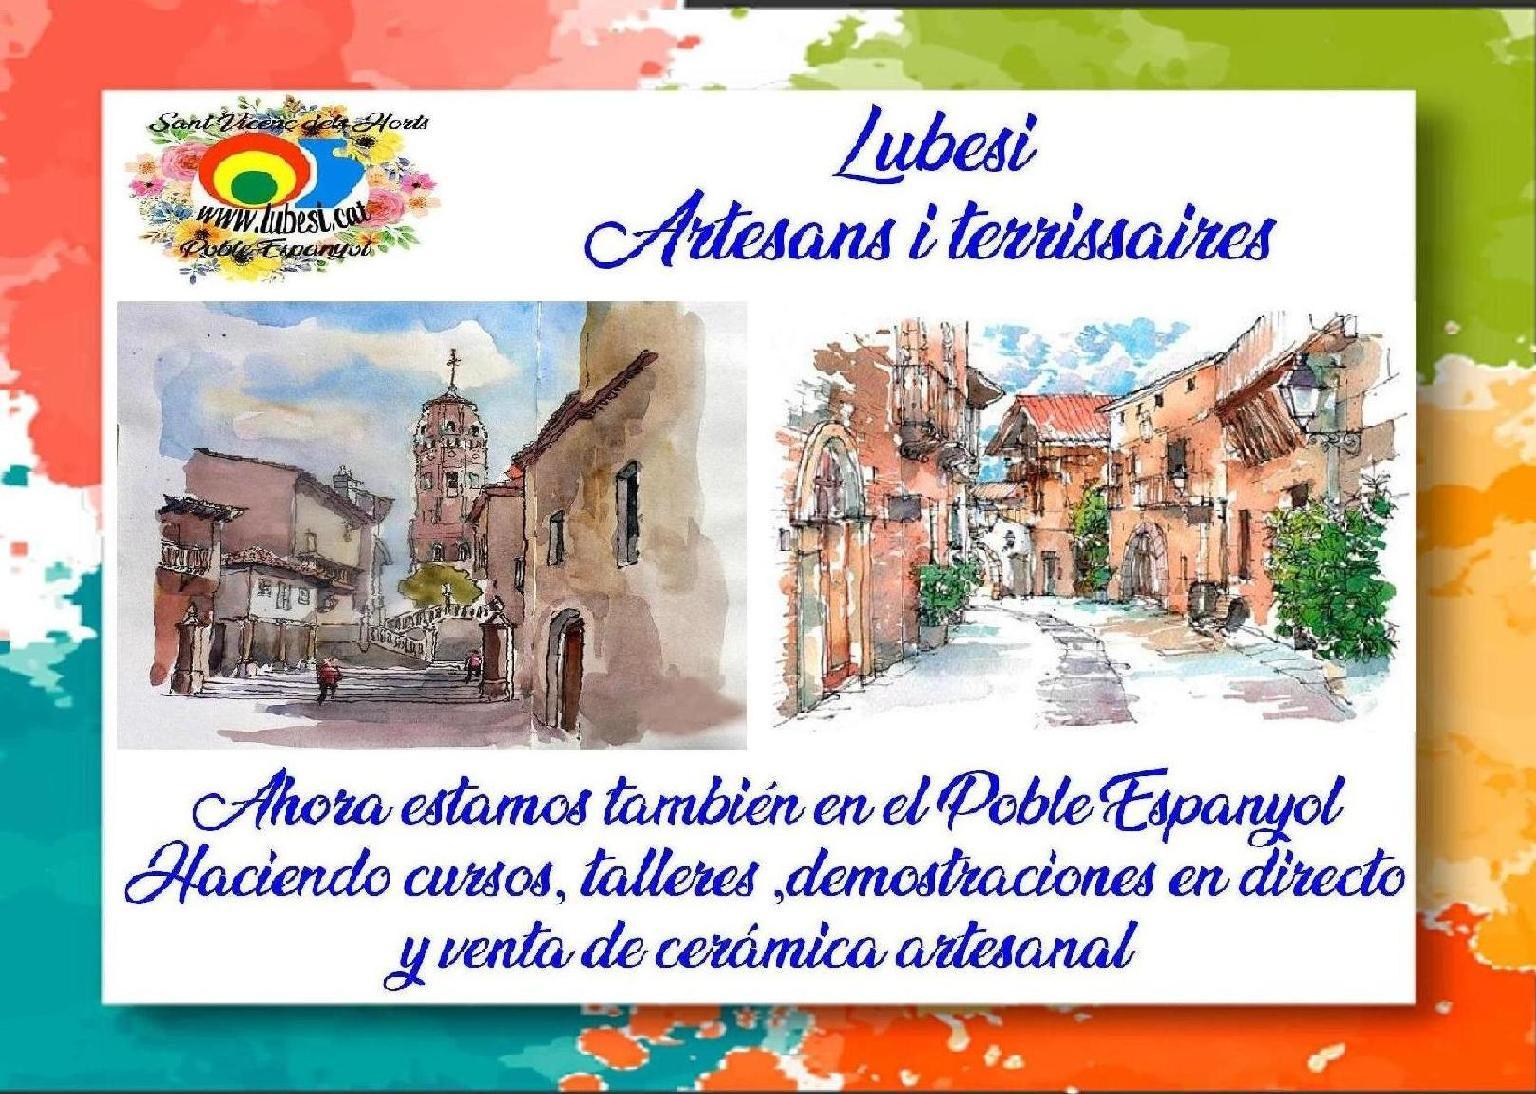 4_slide_anuncio-poble-espanyol.jpg